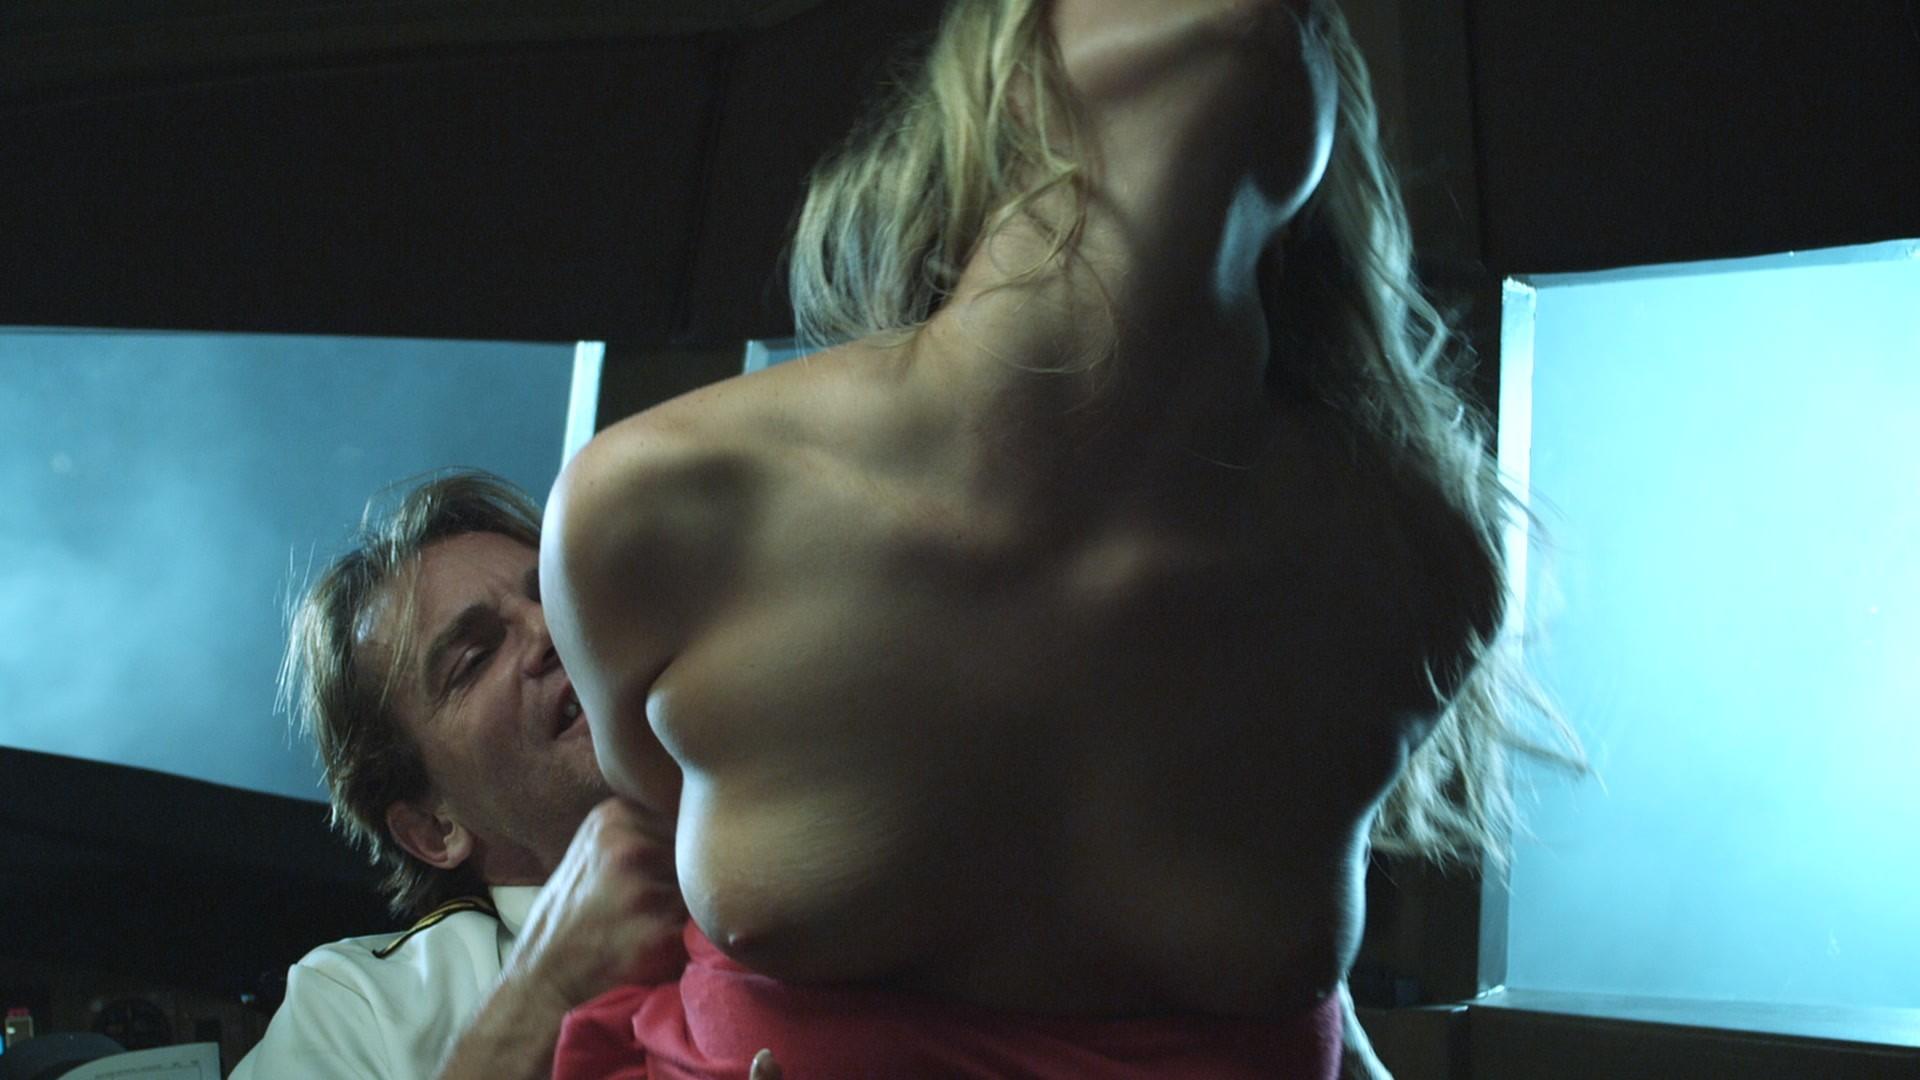 mom big tits videos